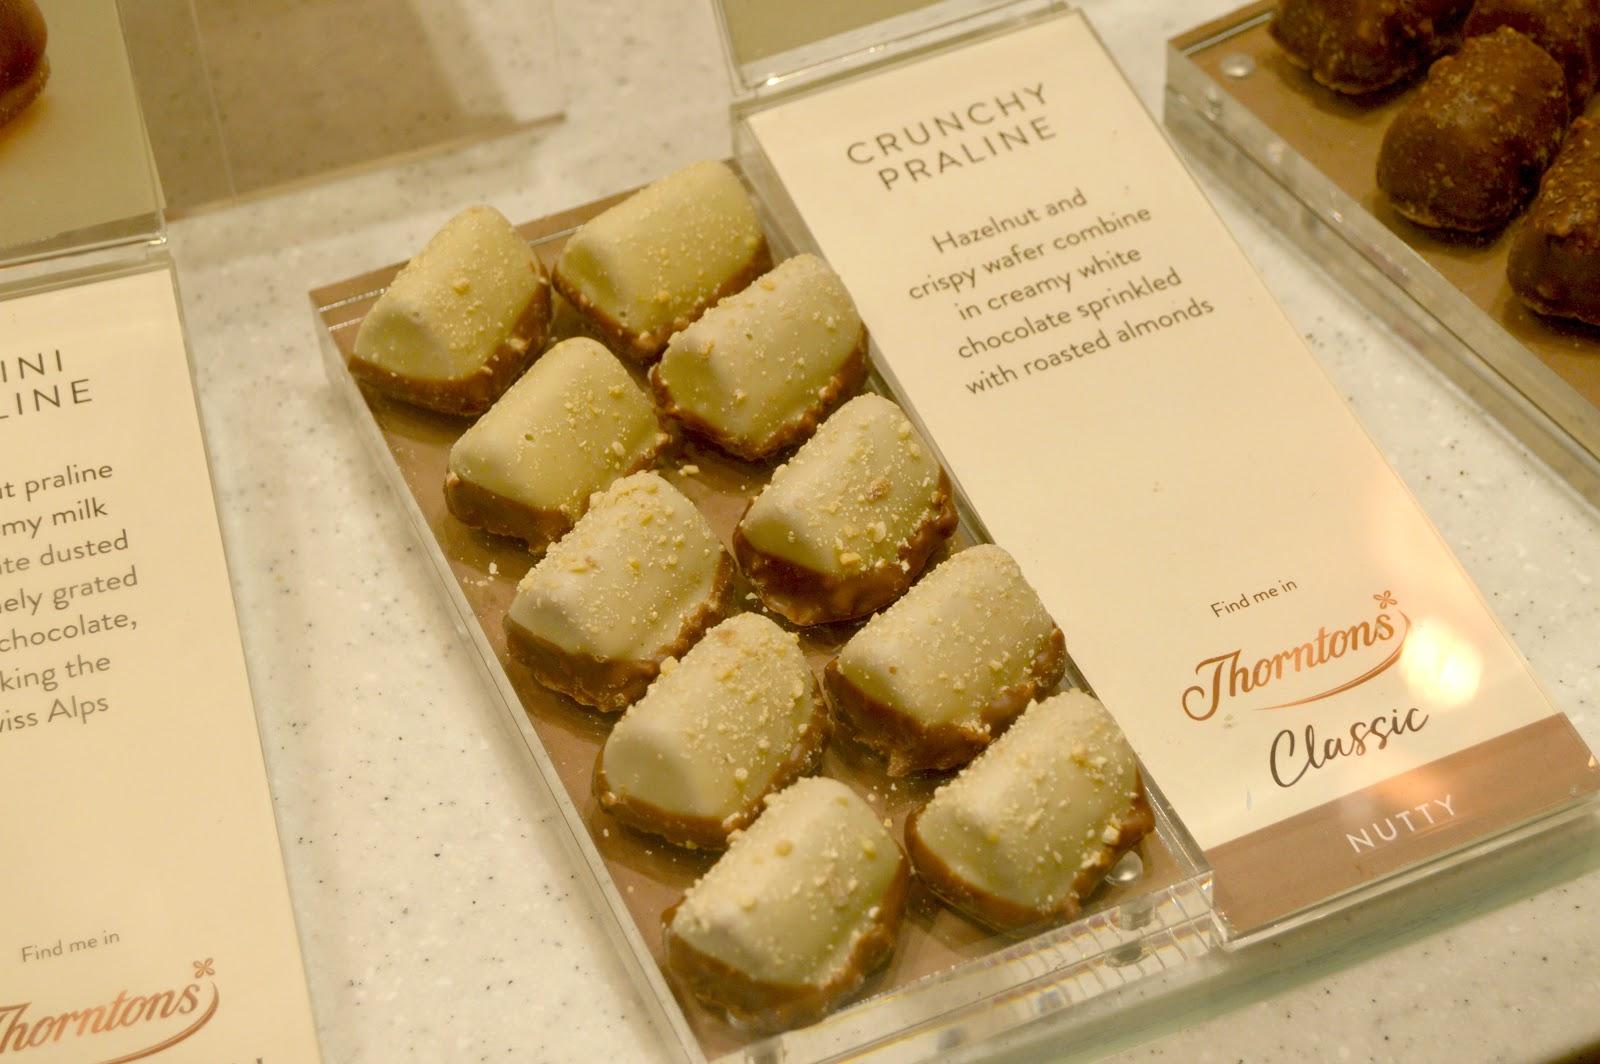 thorntons crunchy praline chocolates